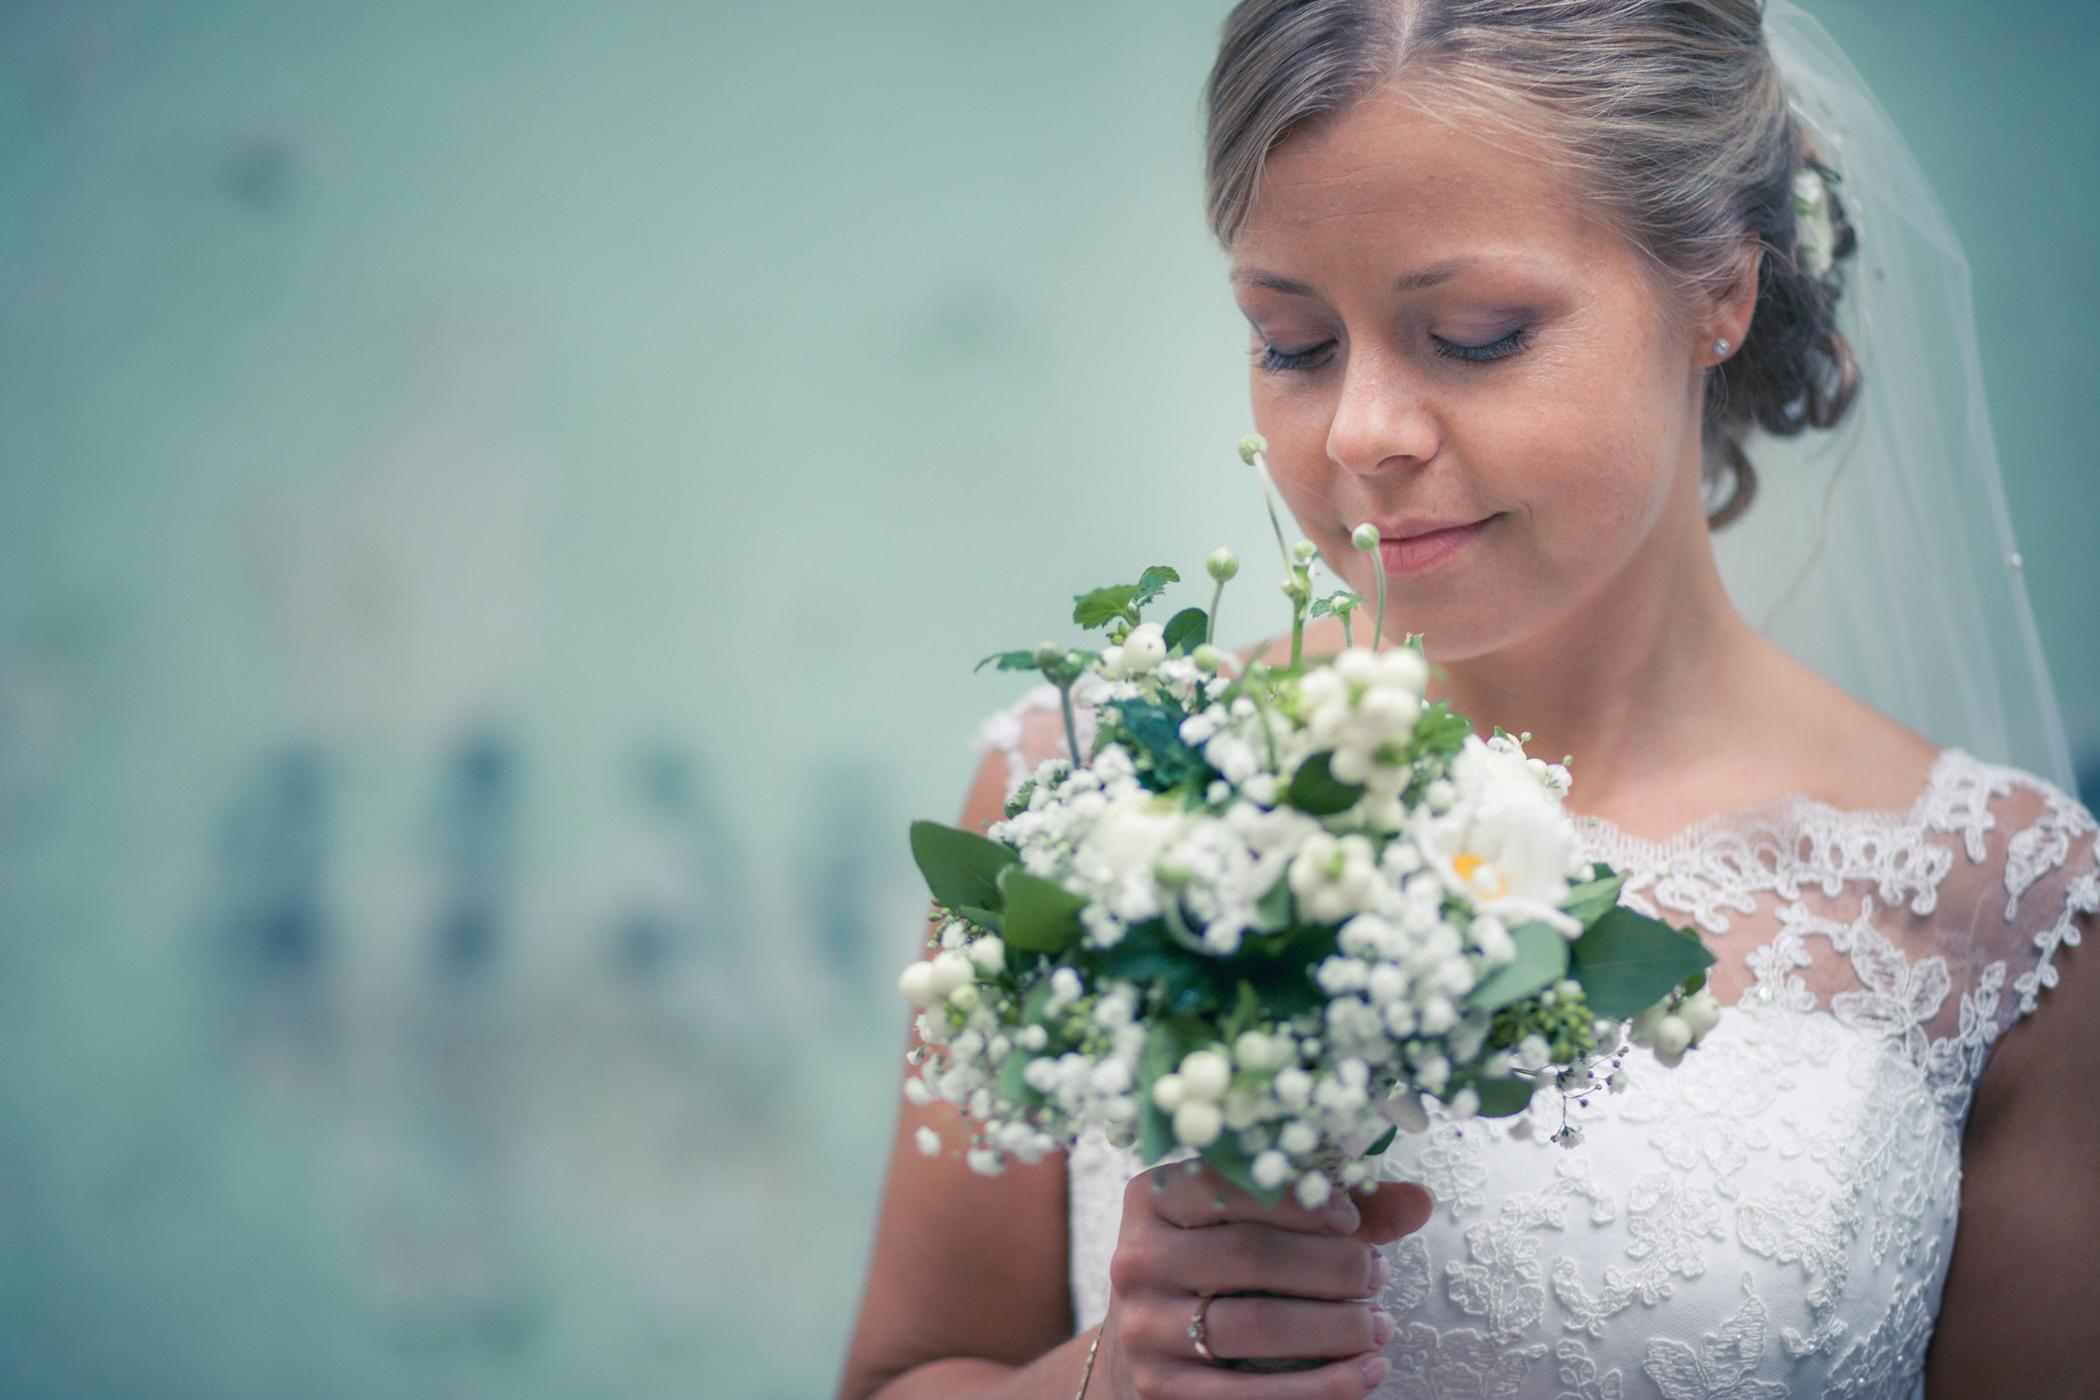 Bruidsreportage-Alie-Ernst-Jan-webcover-Bas-Driessen-Fotografie